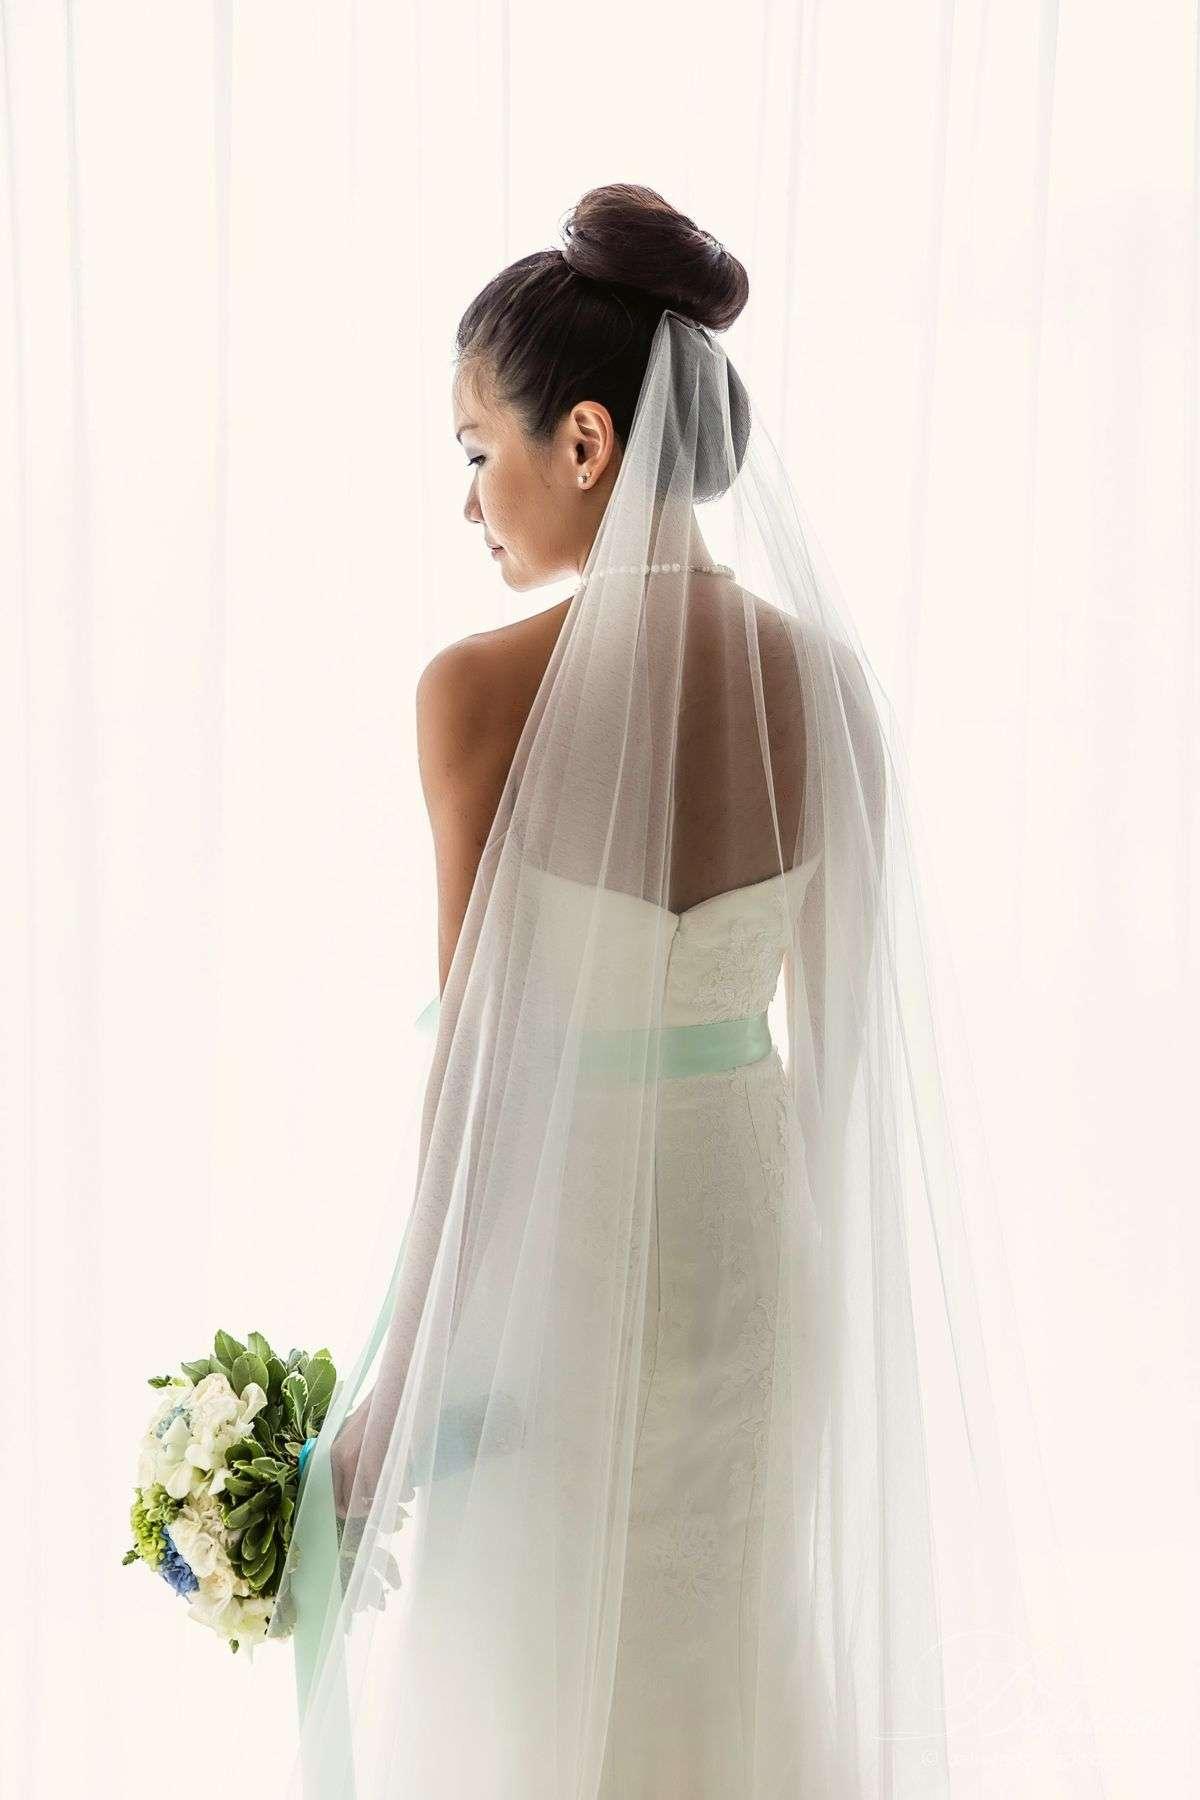 fashion wedding photos